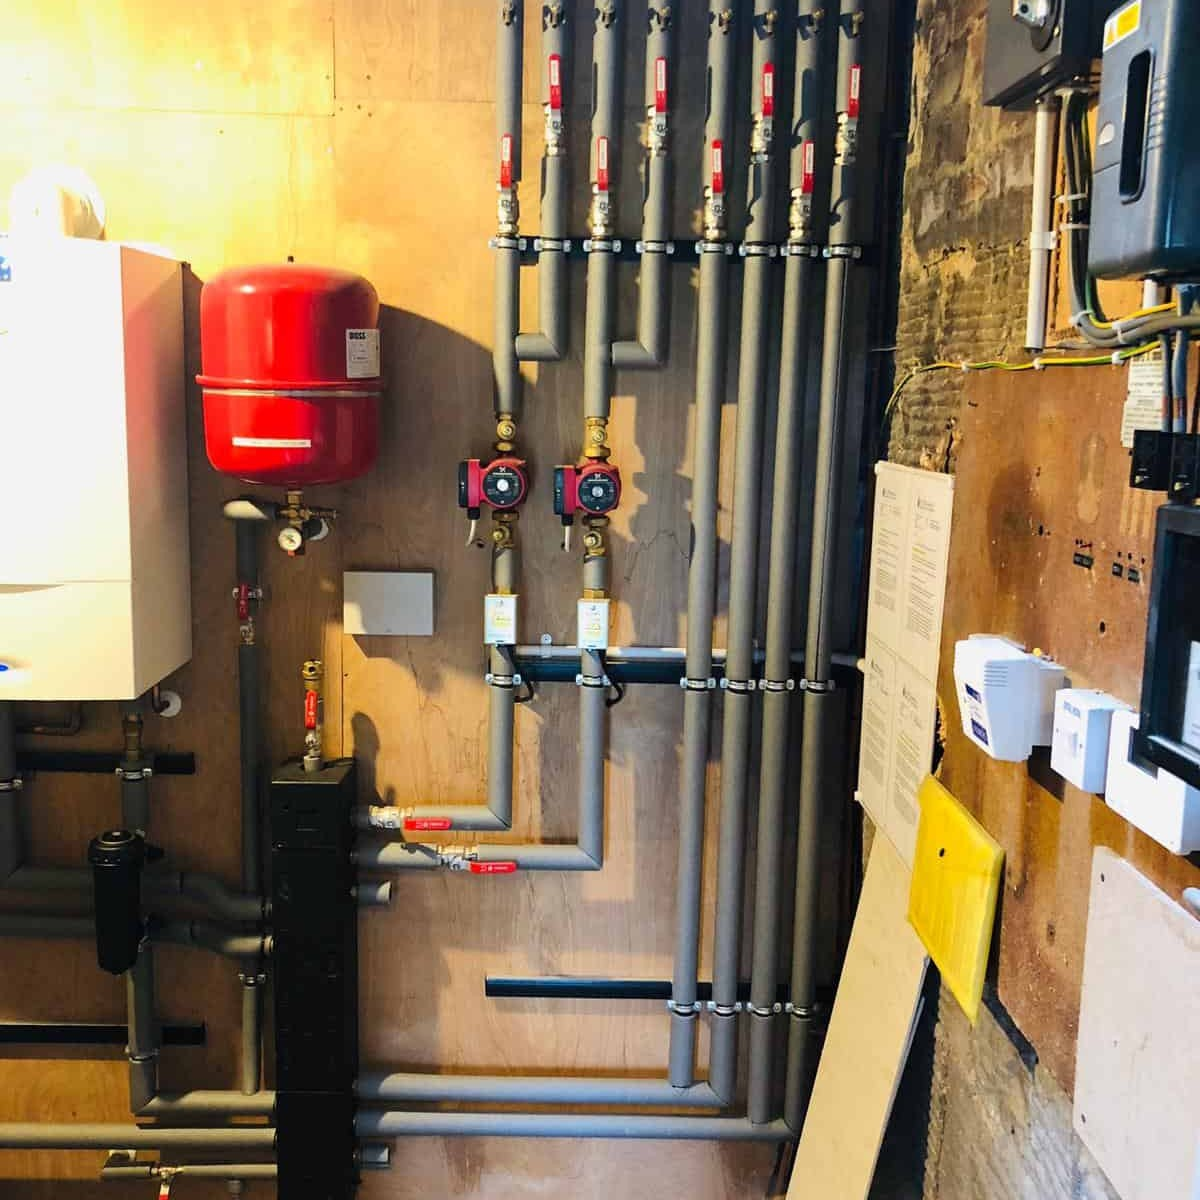 Photos from Bishopton Parish Church heating system 34